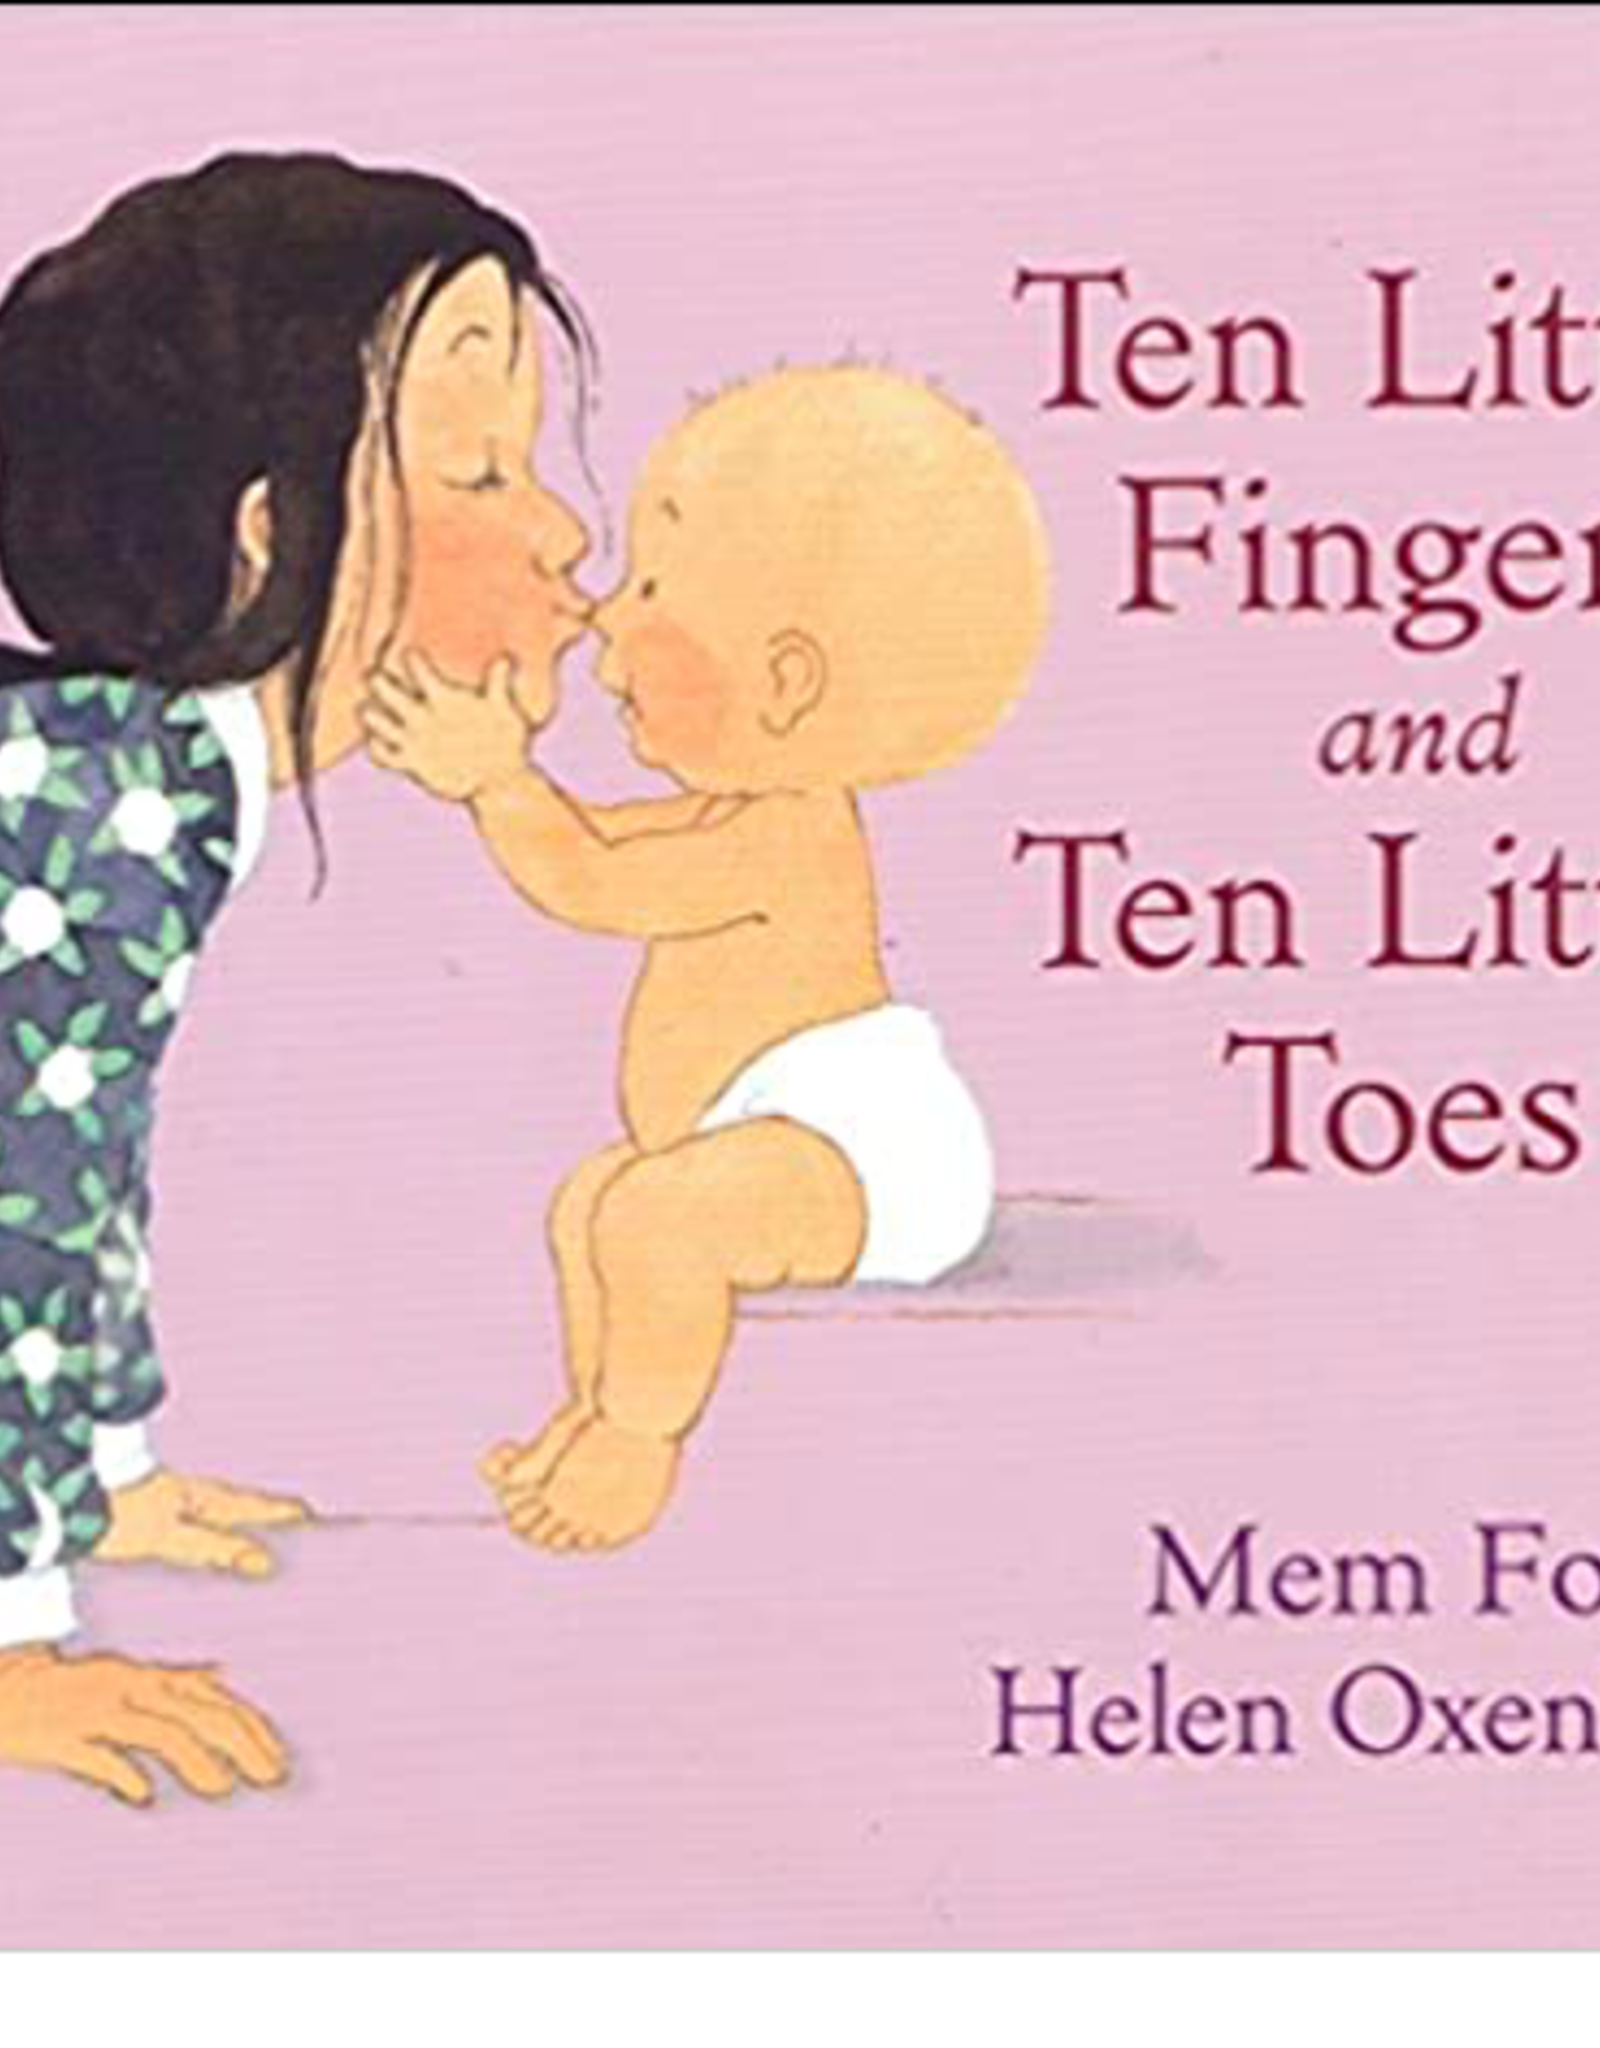 Ten Little Finger and Ten Little Toes (Board Book) - Mex Fox